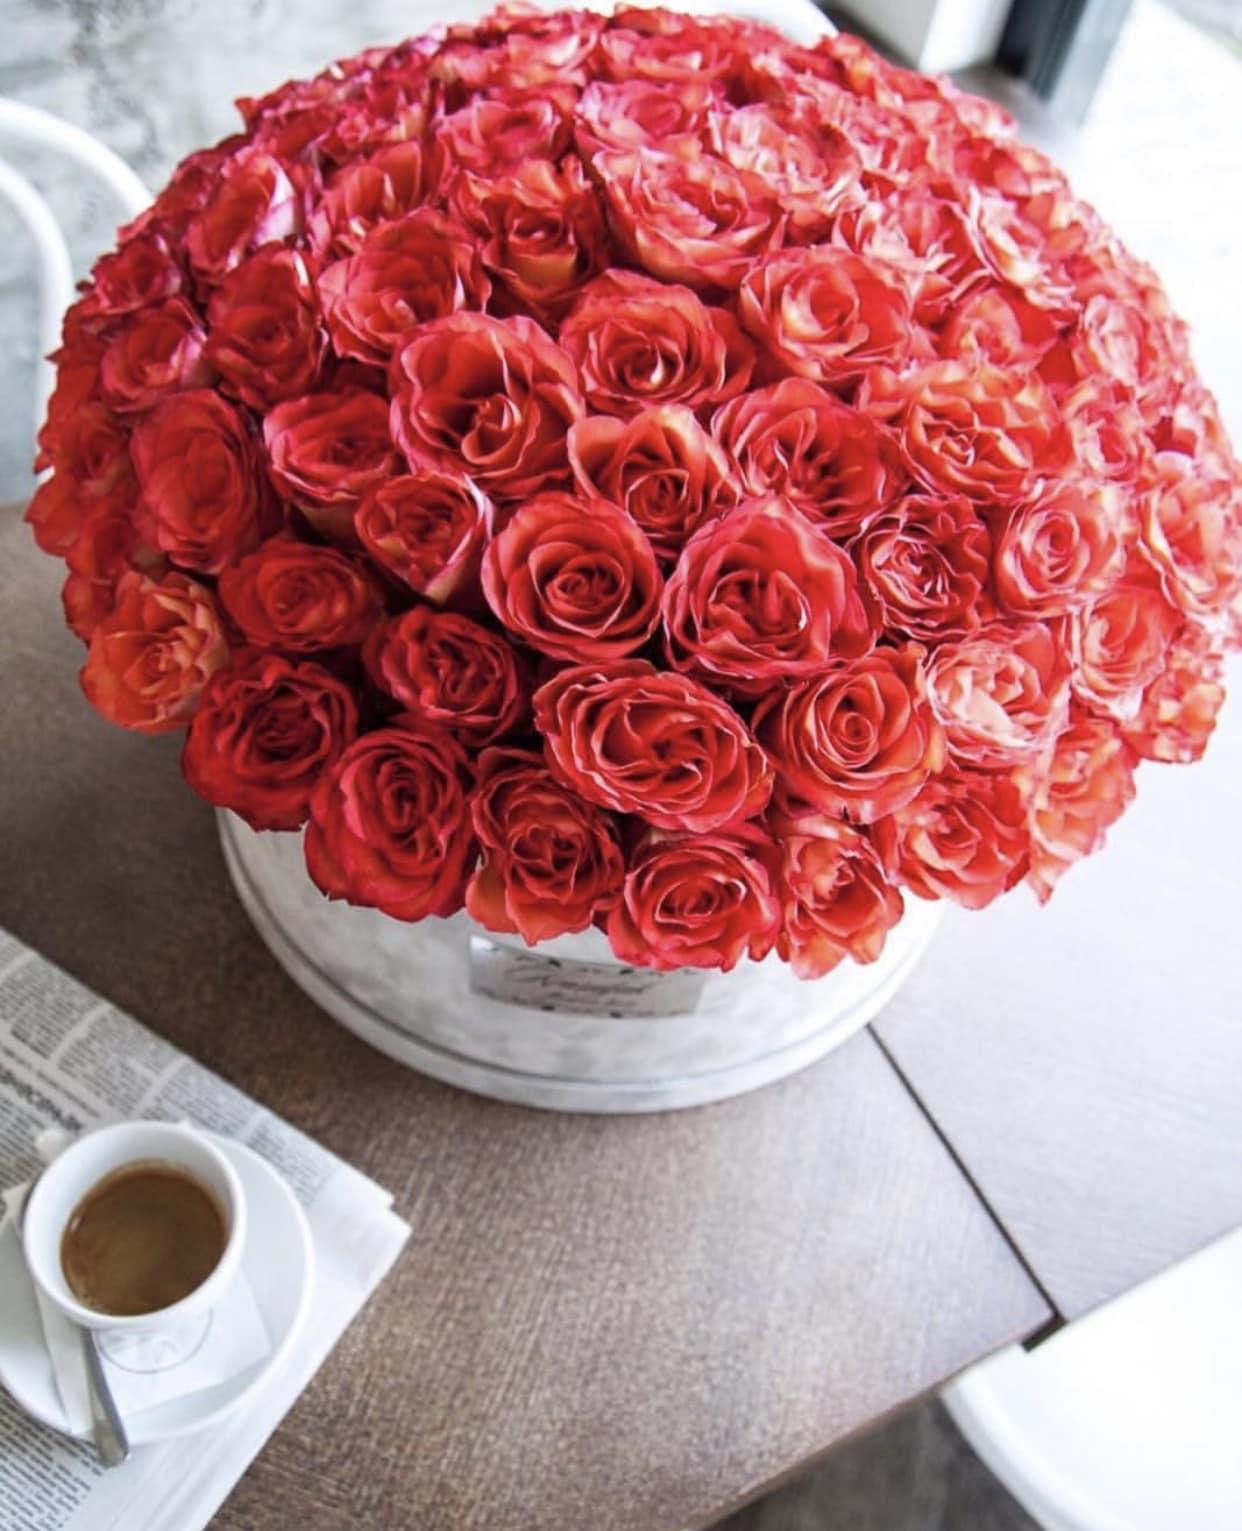 Cvece - Siva plisana kutija sa crvenim ruzama